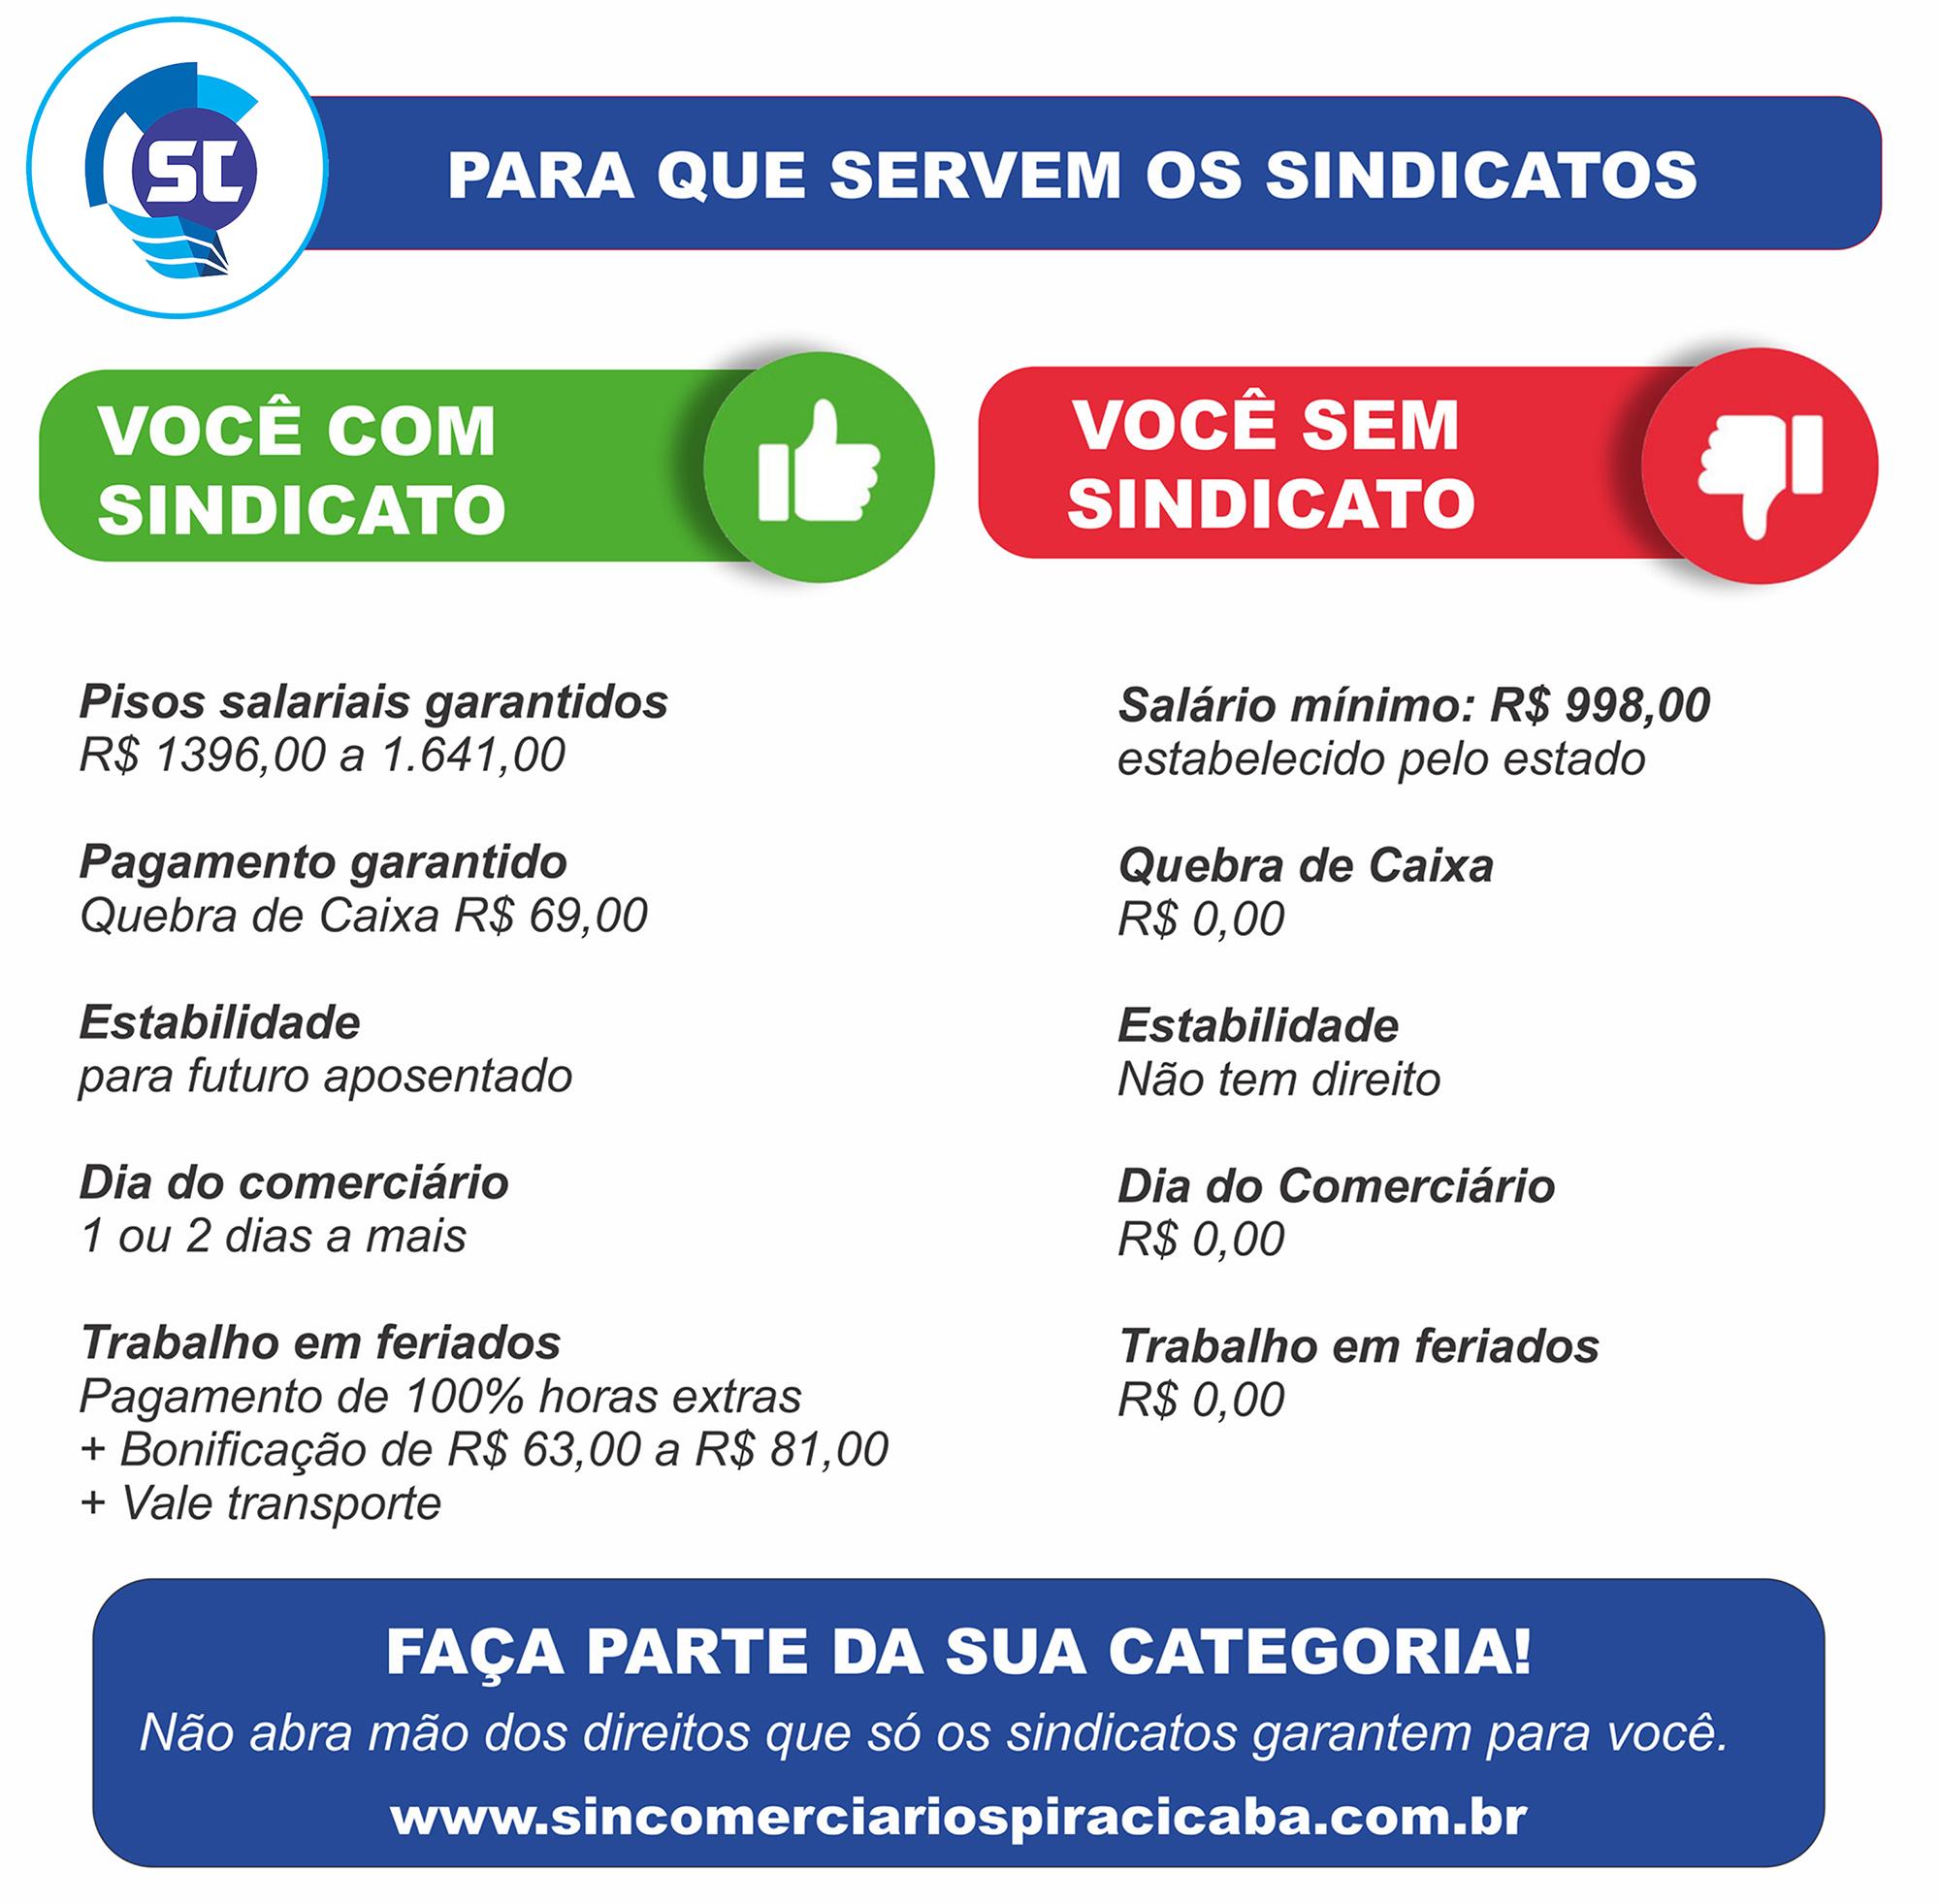 para_que_servem_os_sindicatos